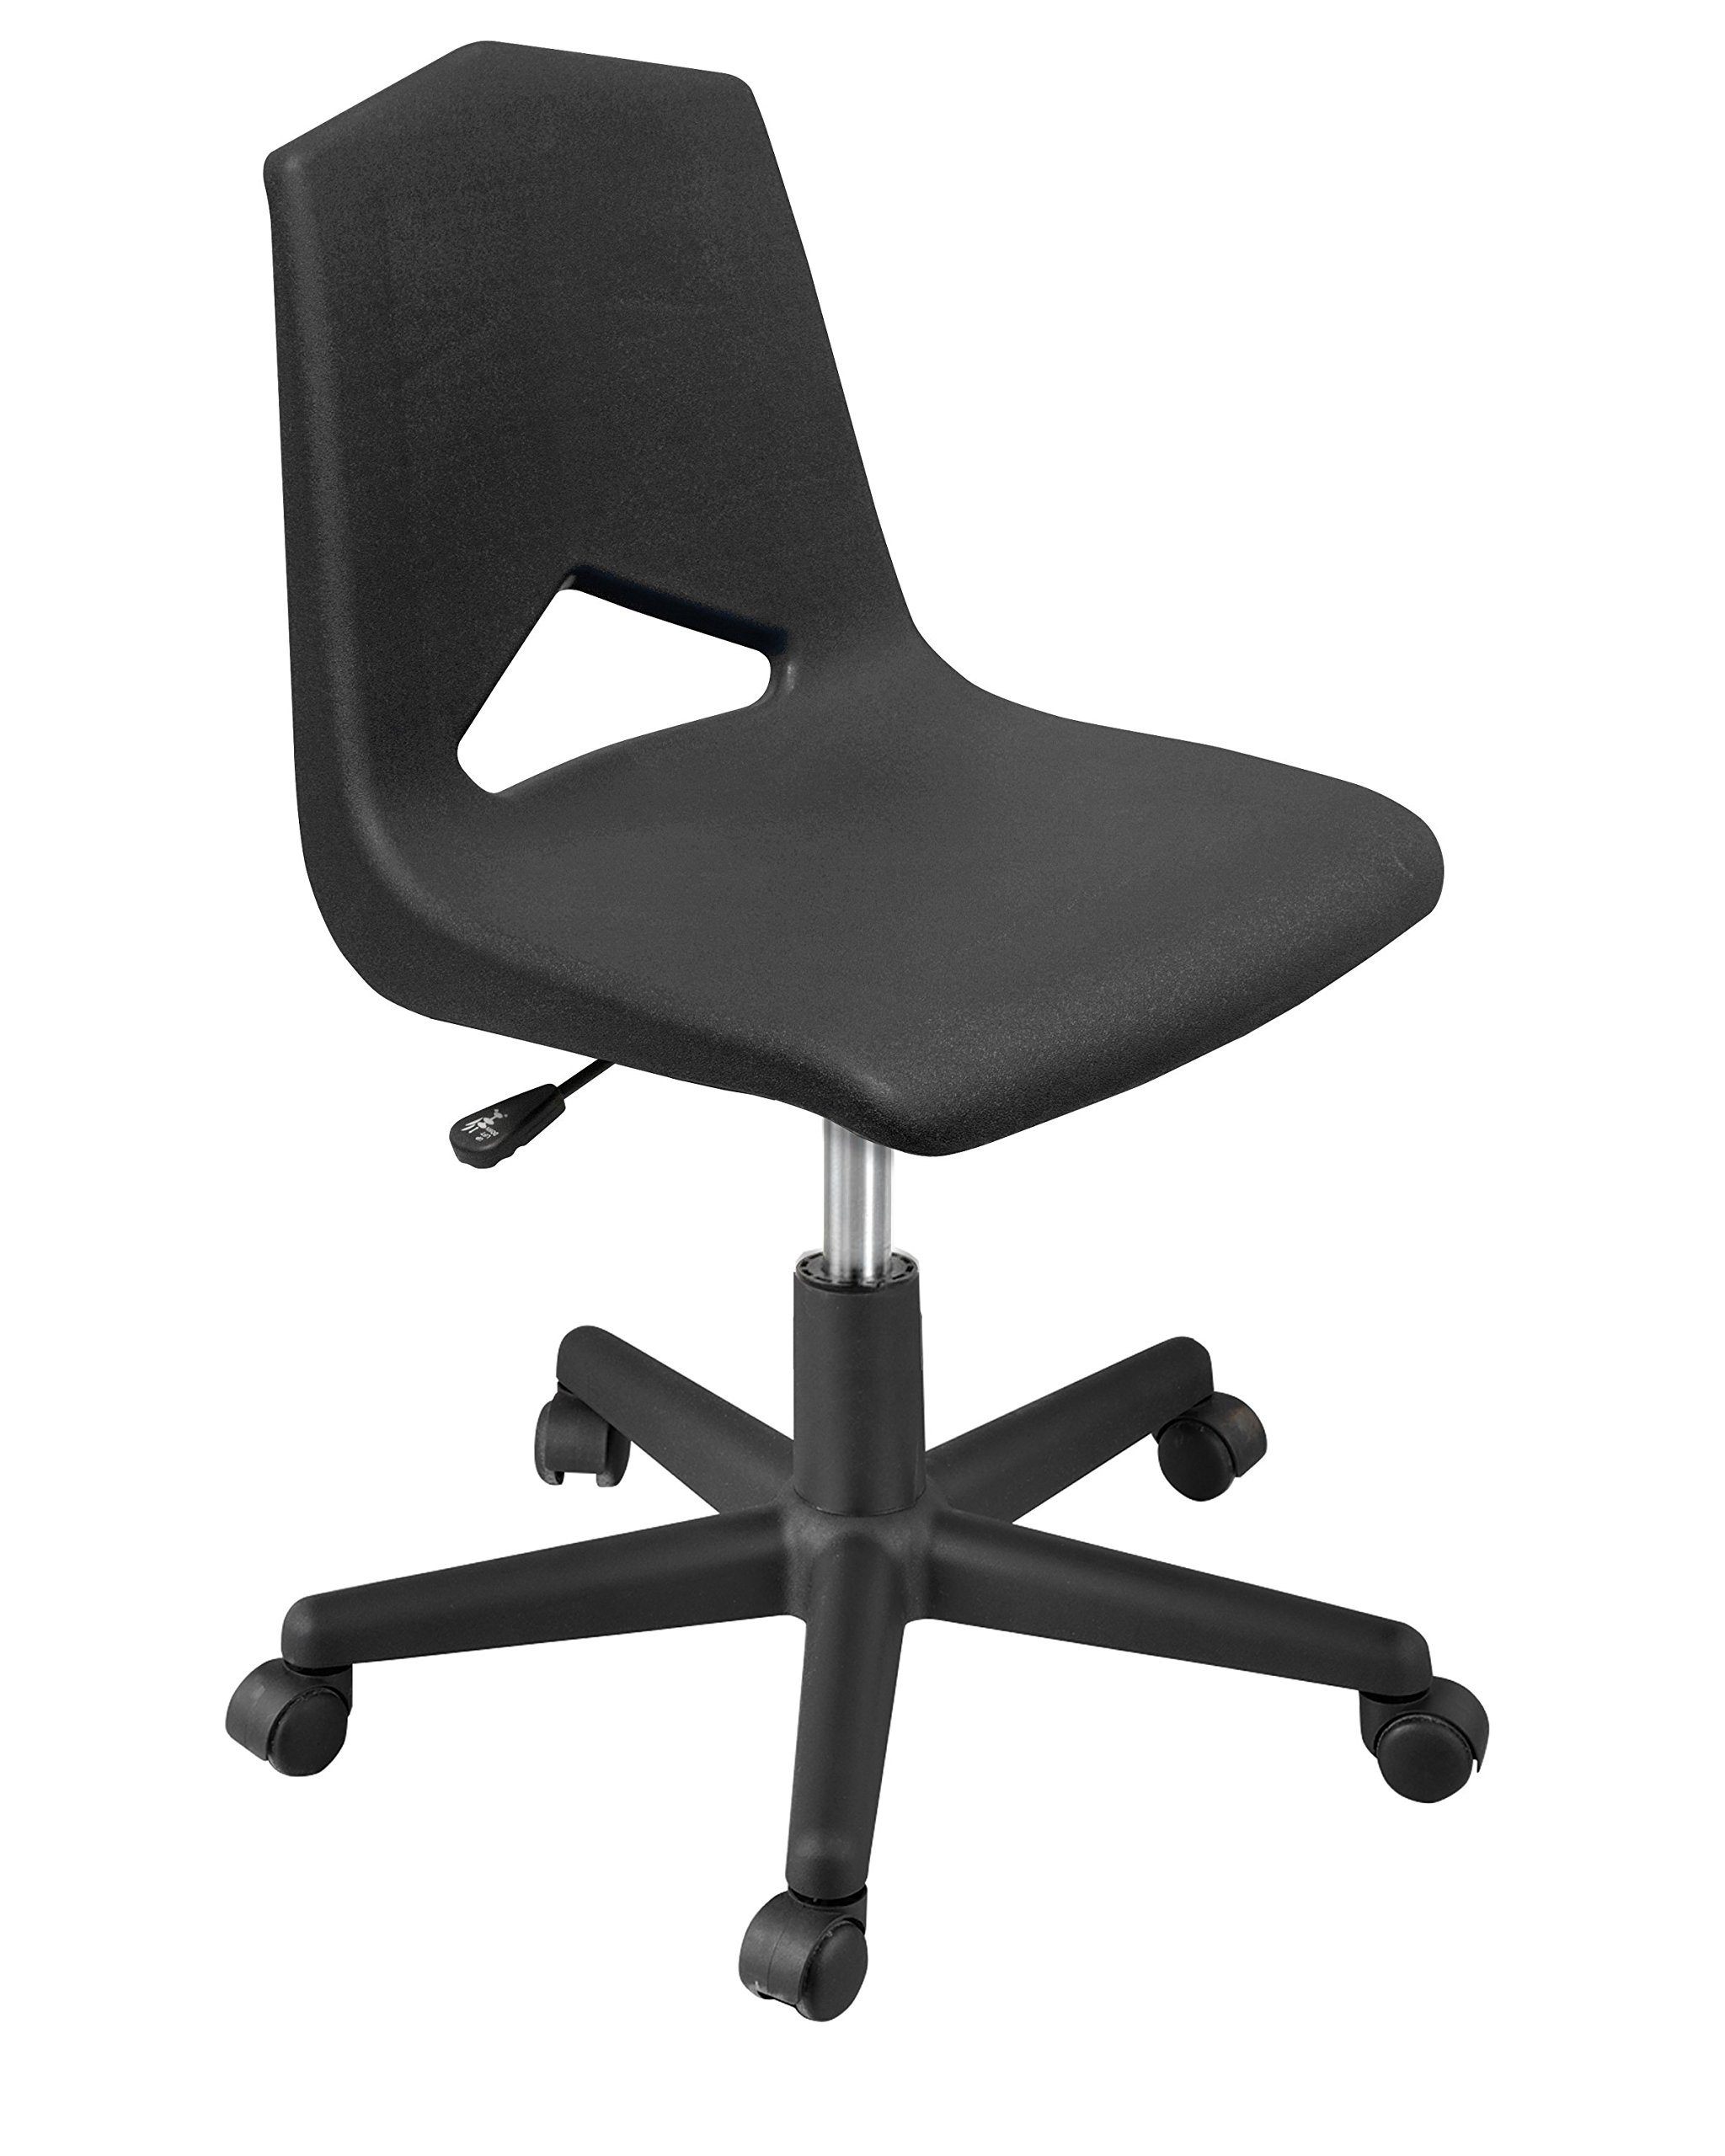 Marco Group MG1182-20BK-ABK Mg Series Adjustable Task Chair, 16''-20'', Black/Black, 2''